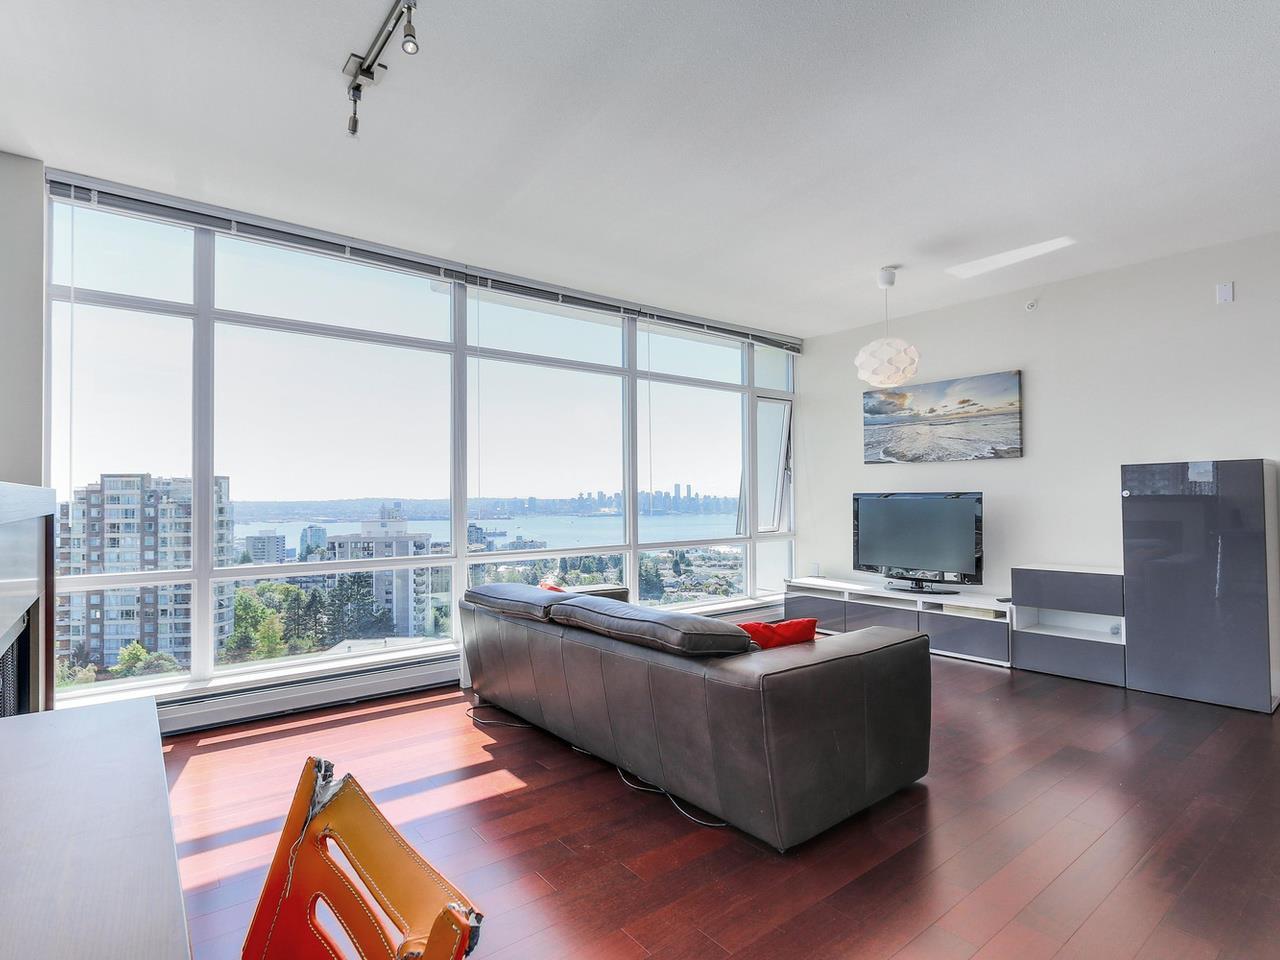 Condo Apartment at 1201 1320 CHESTERFIELD AVENUE, Unit 1201, North Vancouver, British Columbia. Image 7